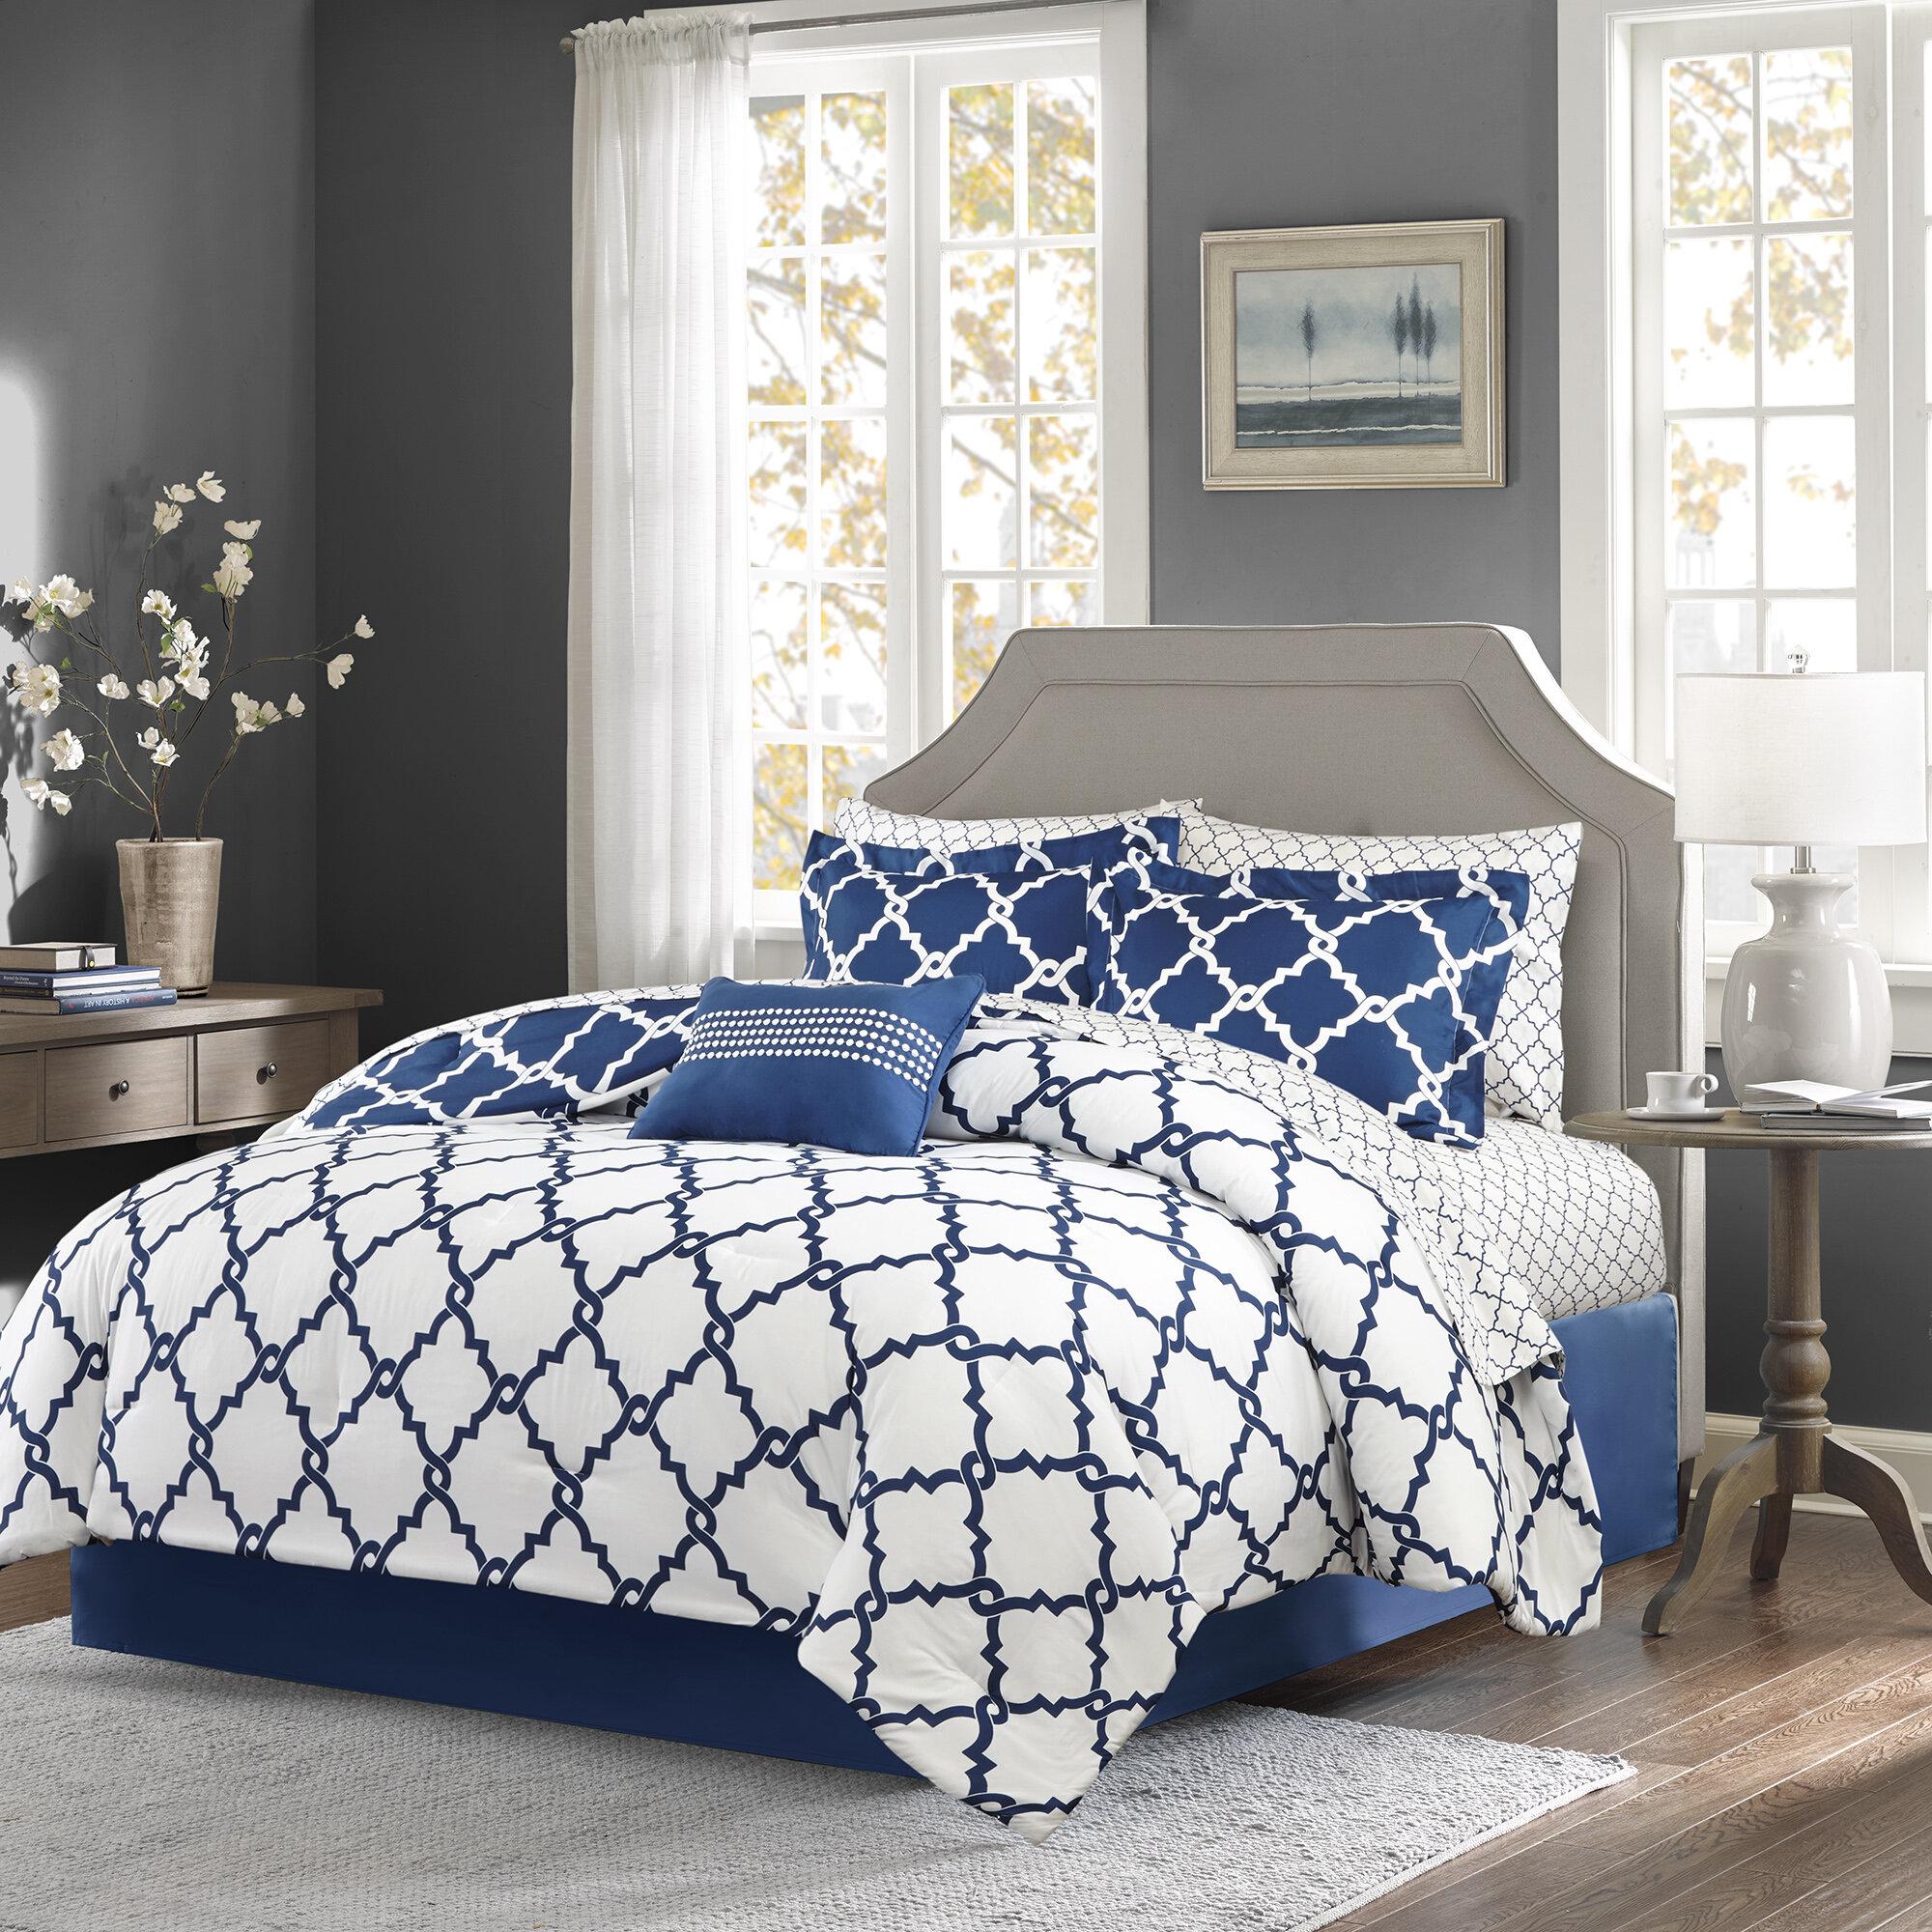 Willa Arlo Interiors Geometric 7 Piece Bed In A Bag Reversible Comforter Reviews Wayfair